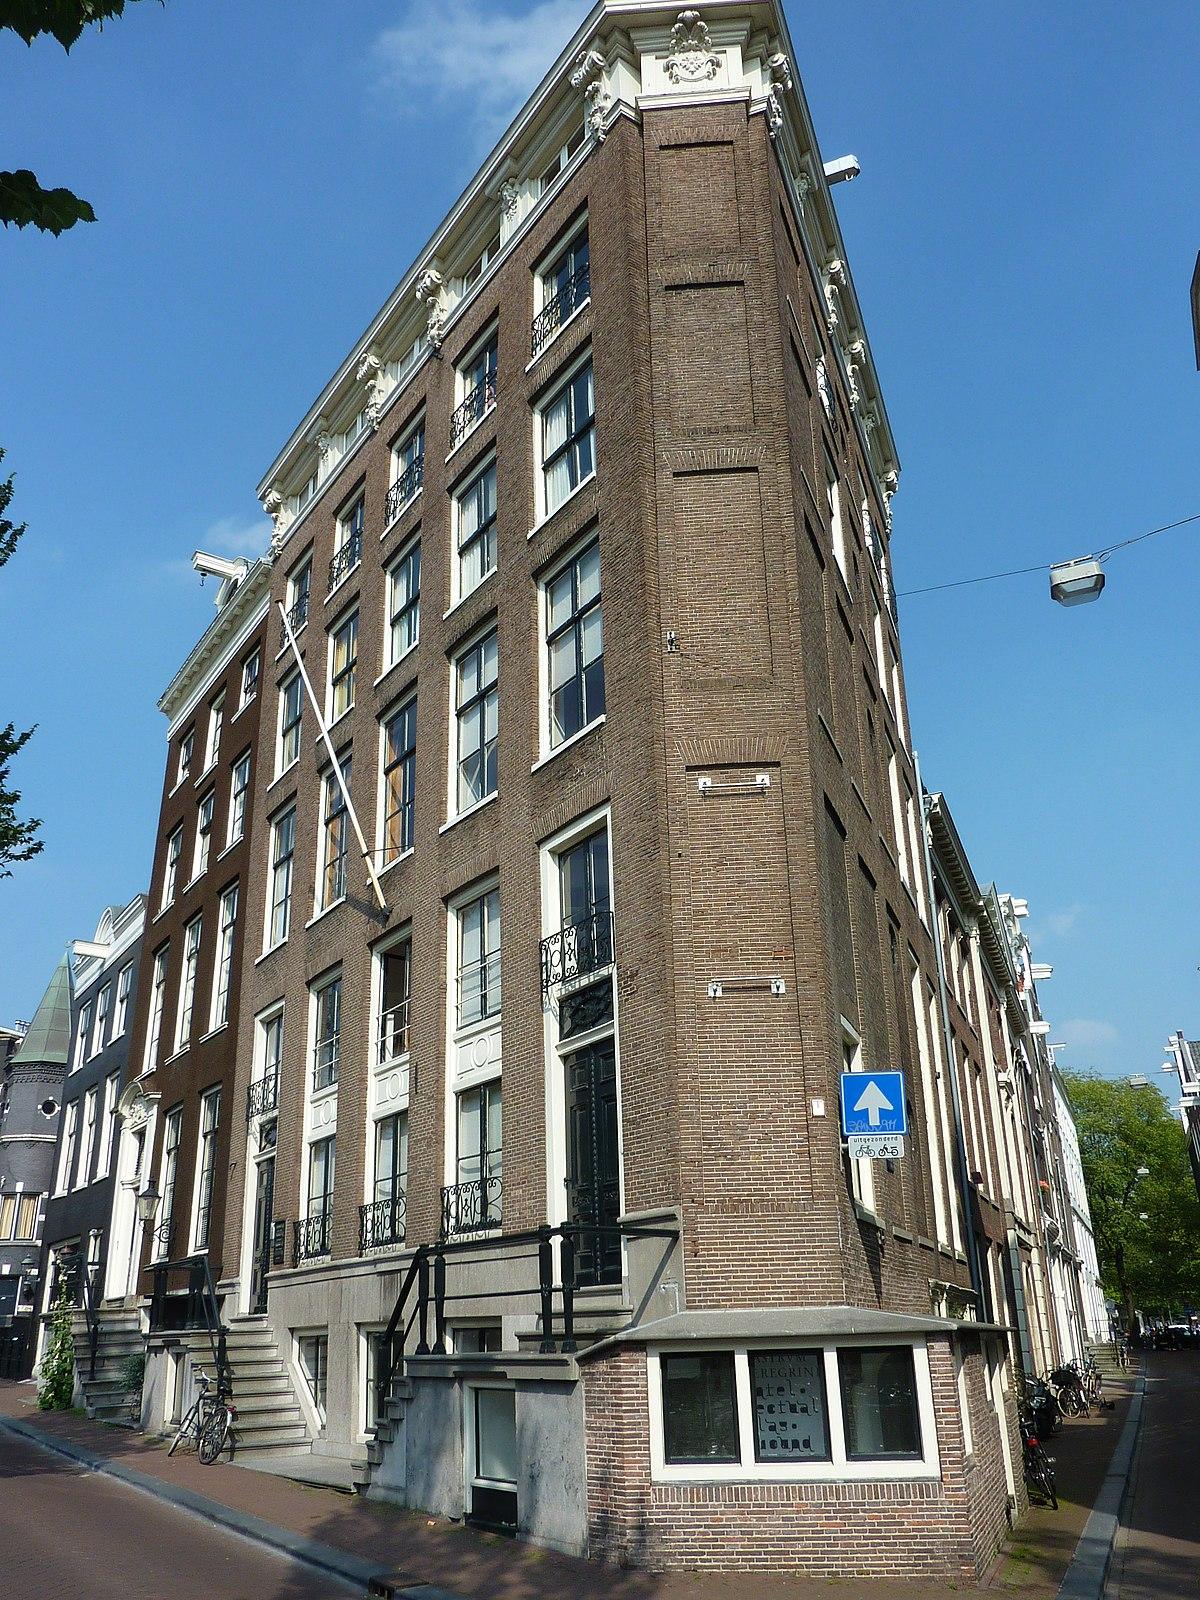 Castrum peregrini wikipedia for Herengracht amsterdam